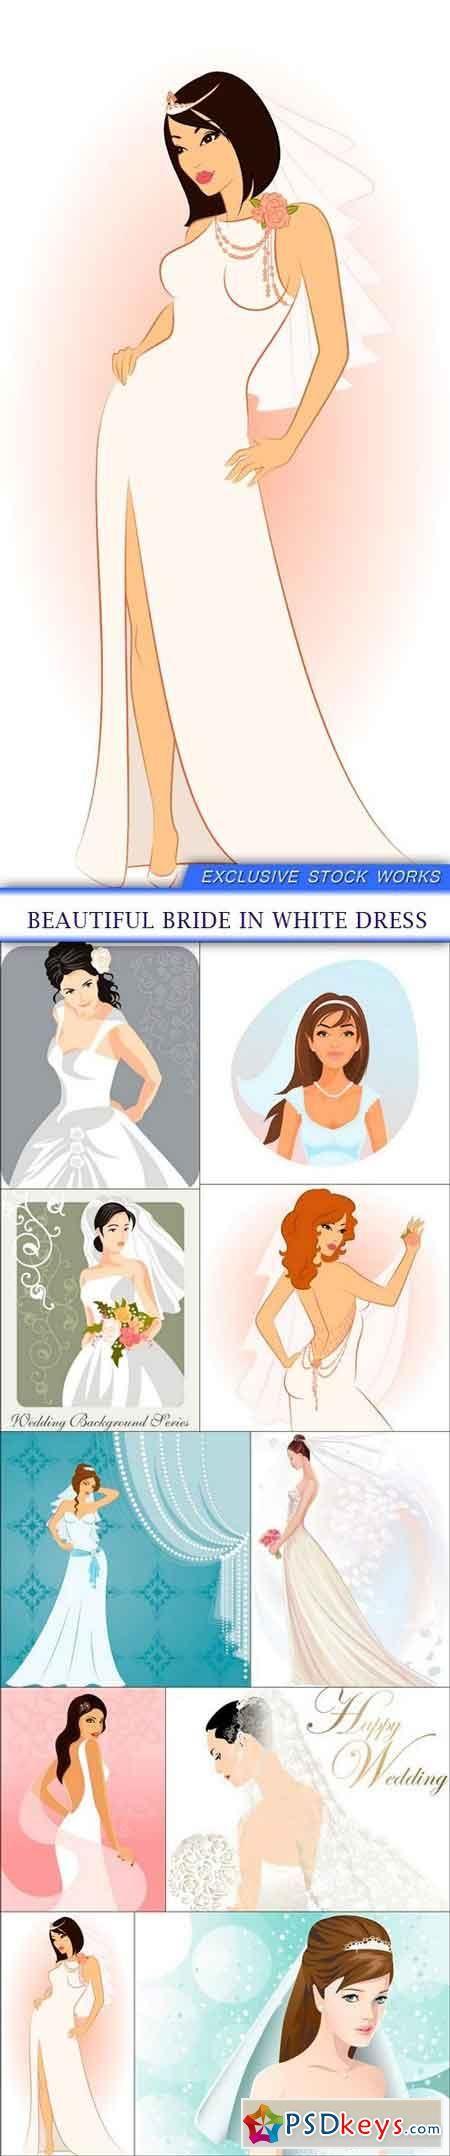 Beautiful Bride In White Dress 10x Eps Beautiful Bride Beautiful Fashion People